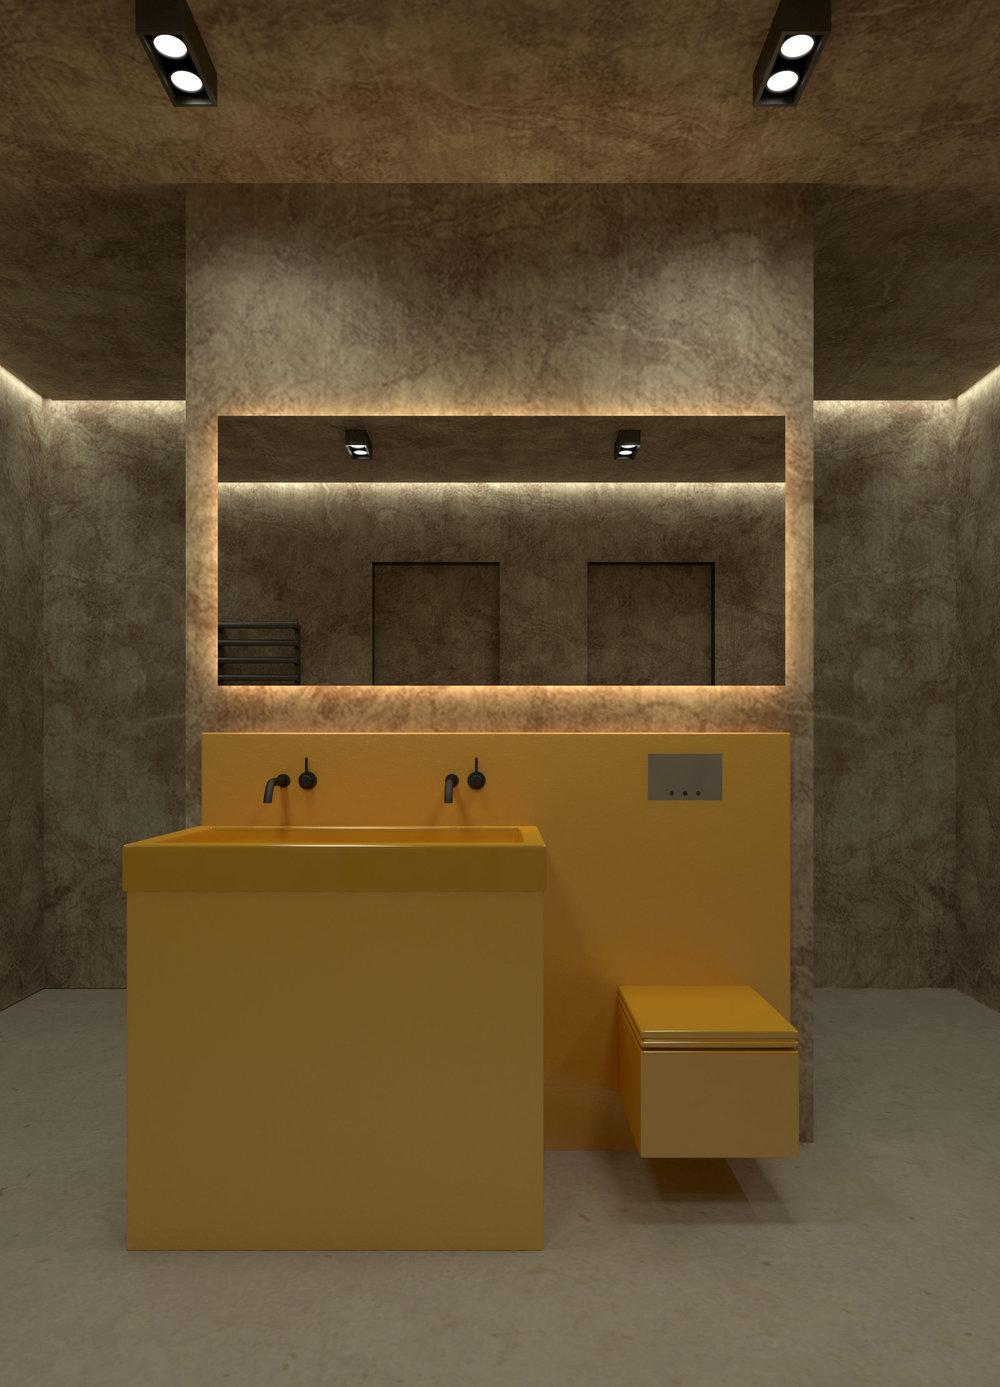 bathroom-002-3d-model-max-obj-3ds-fbx-dwg-mtl.jpg , archival pigment print, 2018